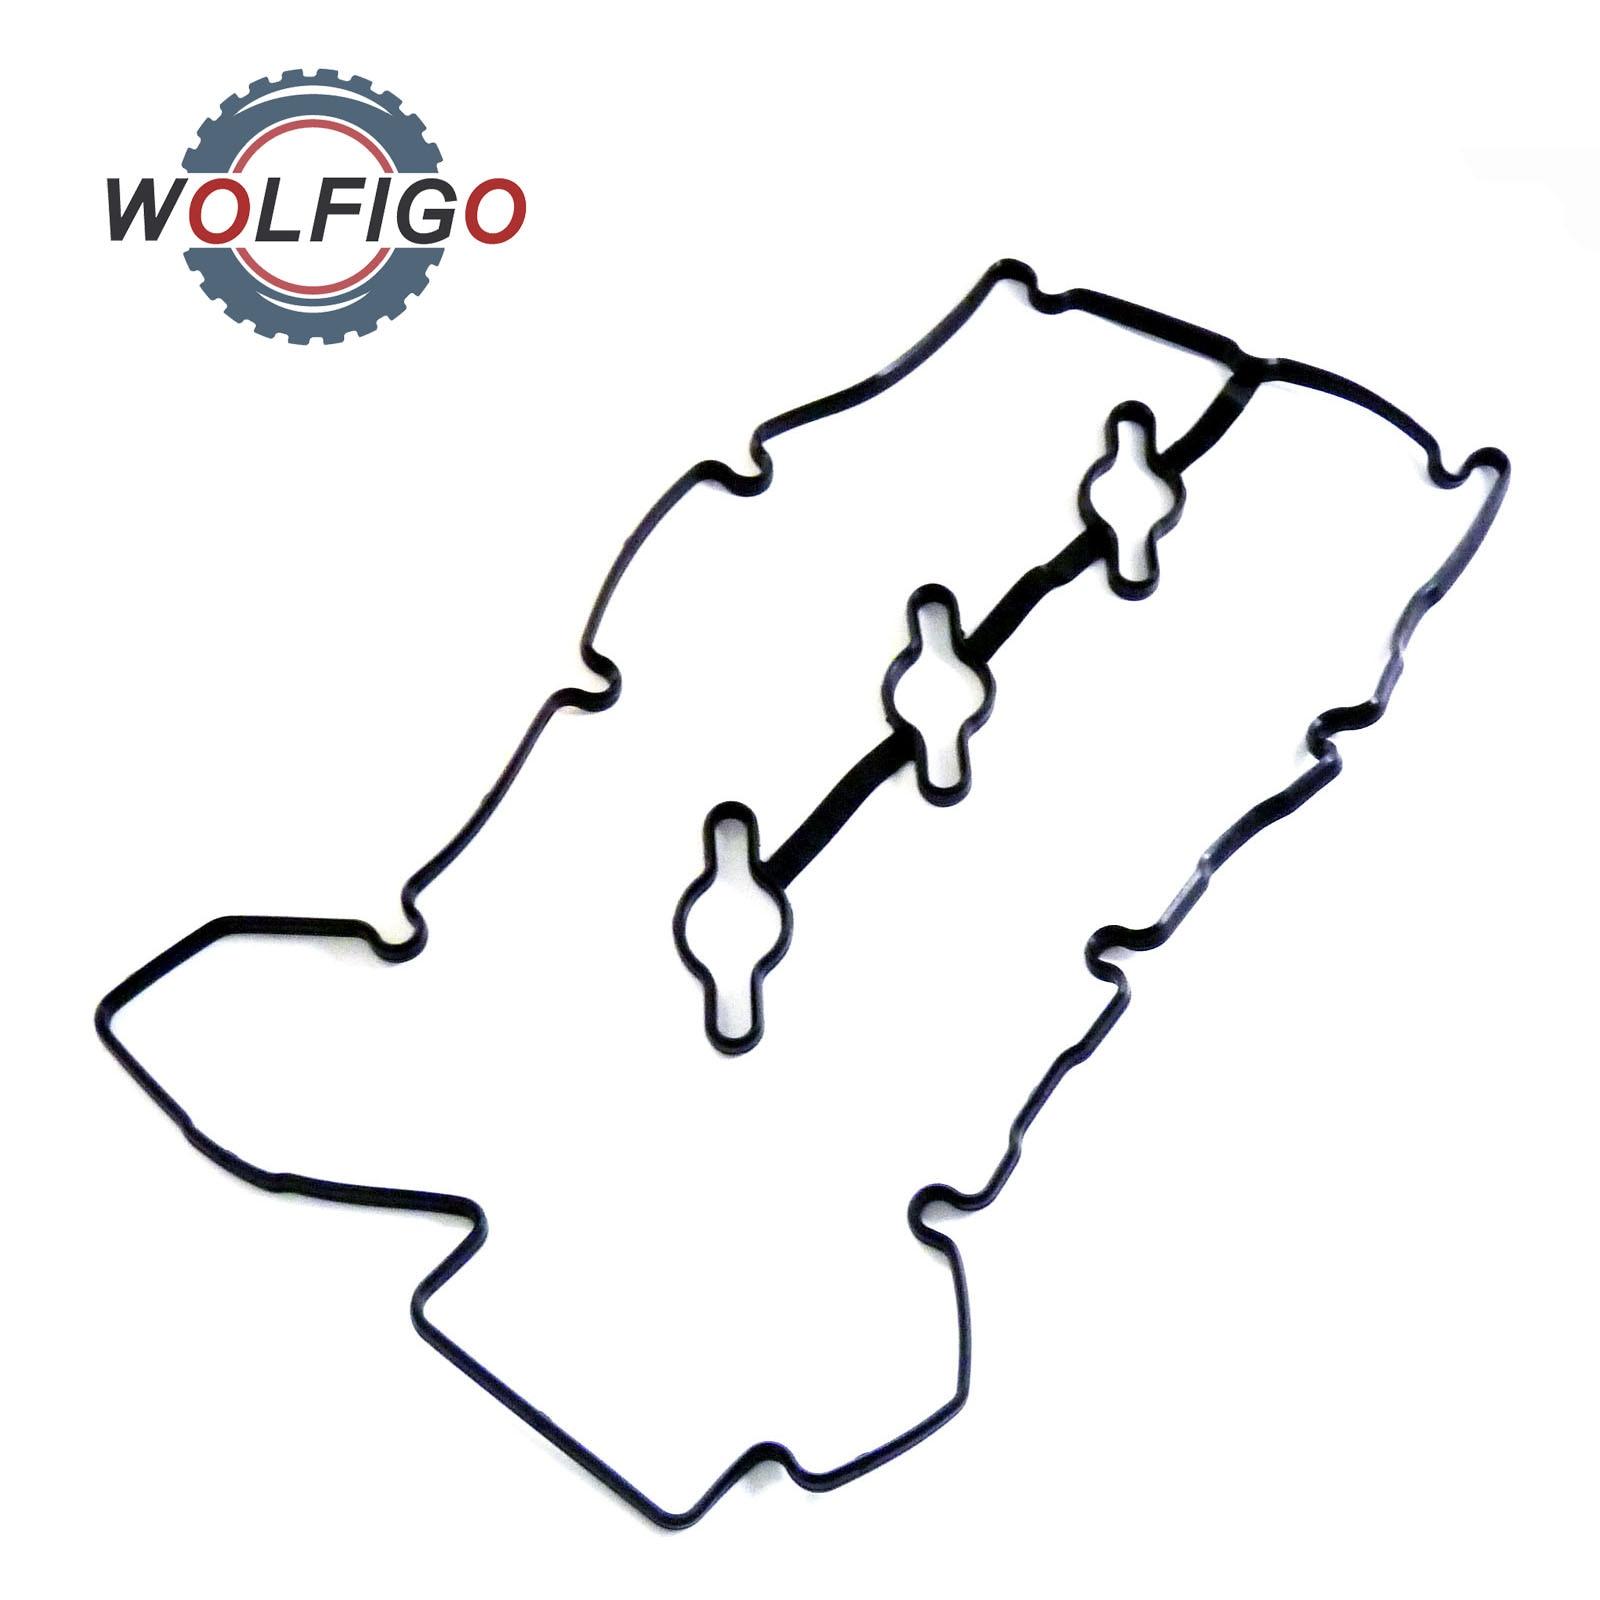 hight resolution of wolfigo right engine valve cover gasket 22441 3c110 vs50750r for hyundai azera kia sorento new